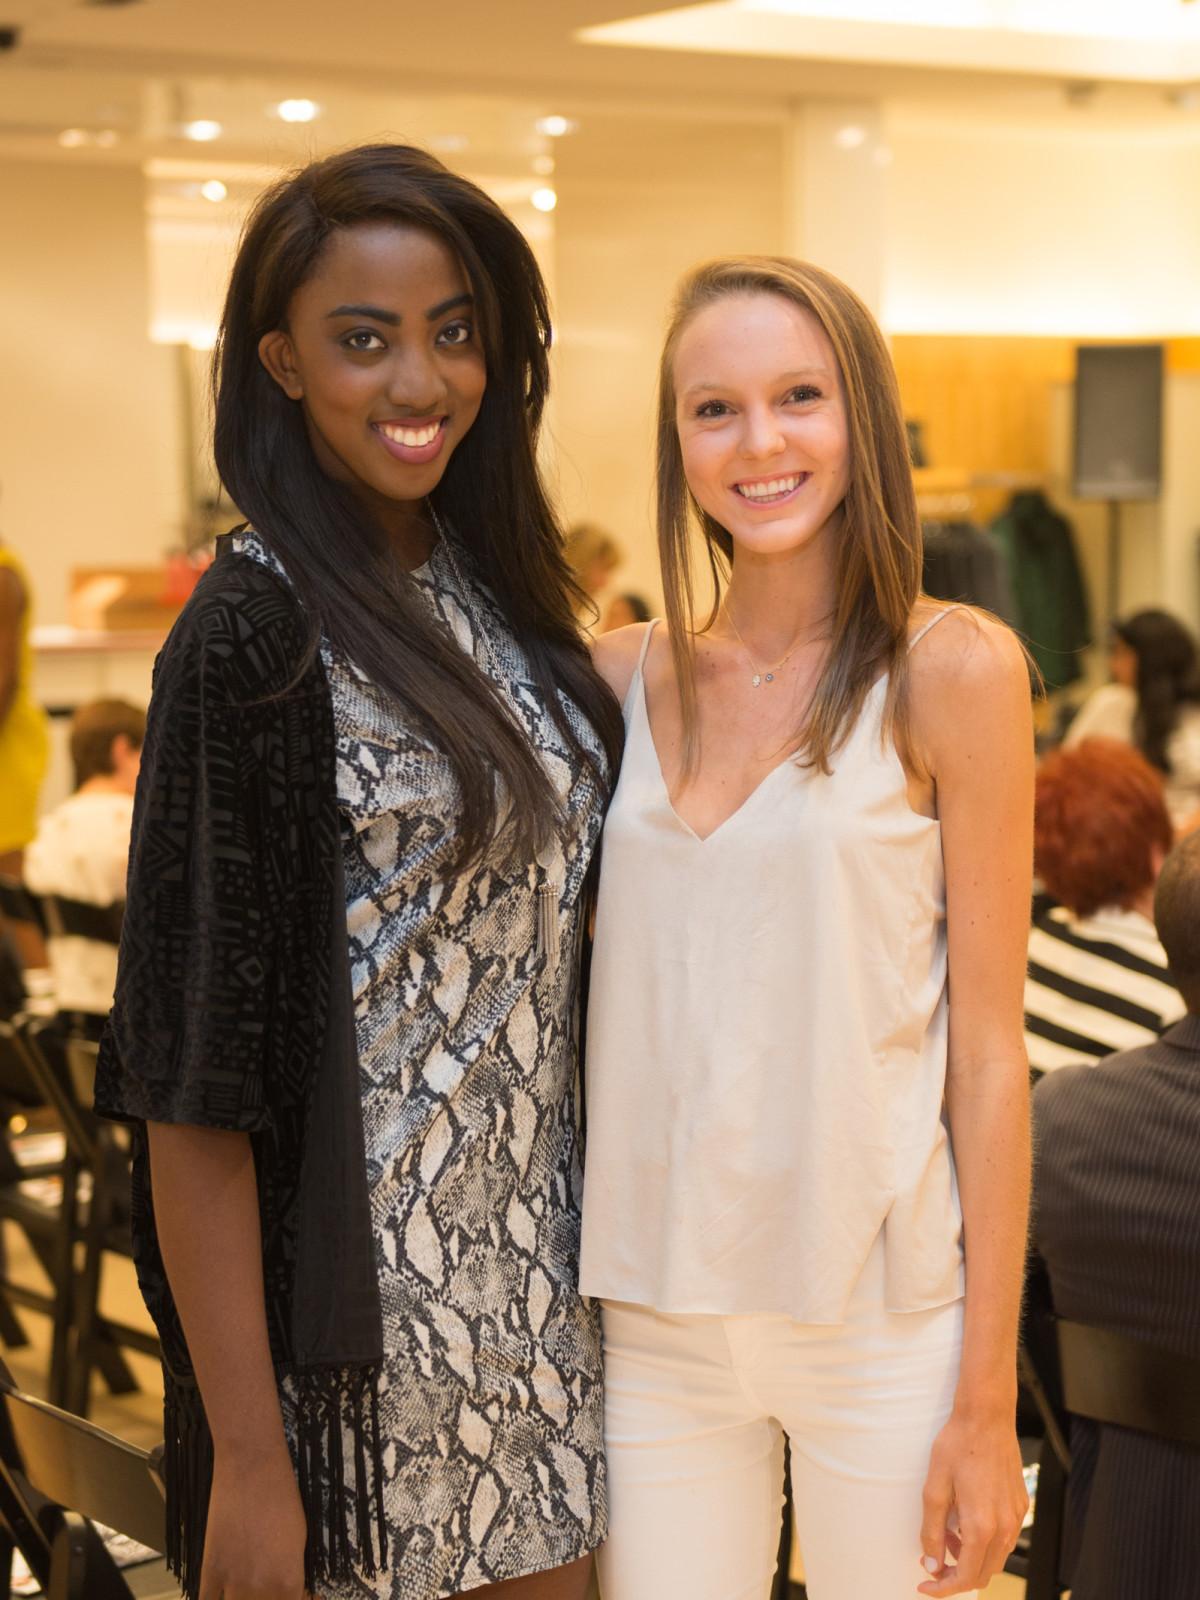 Devon Sells and Alex Odum at Neiman Marcus Trend Event